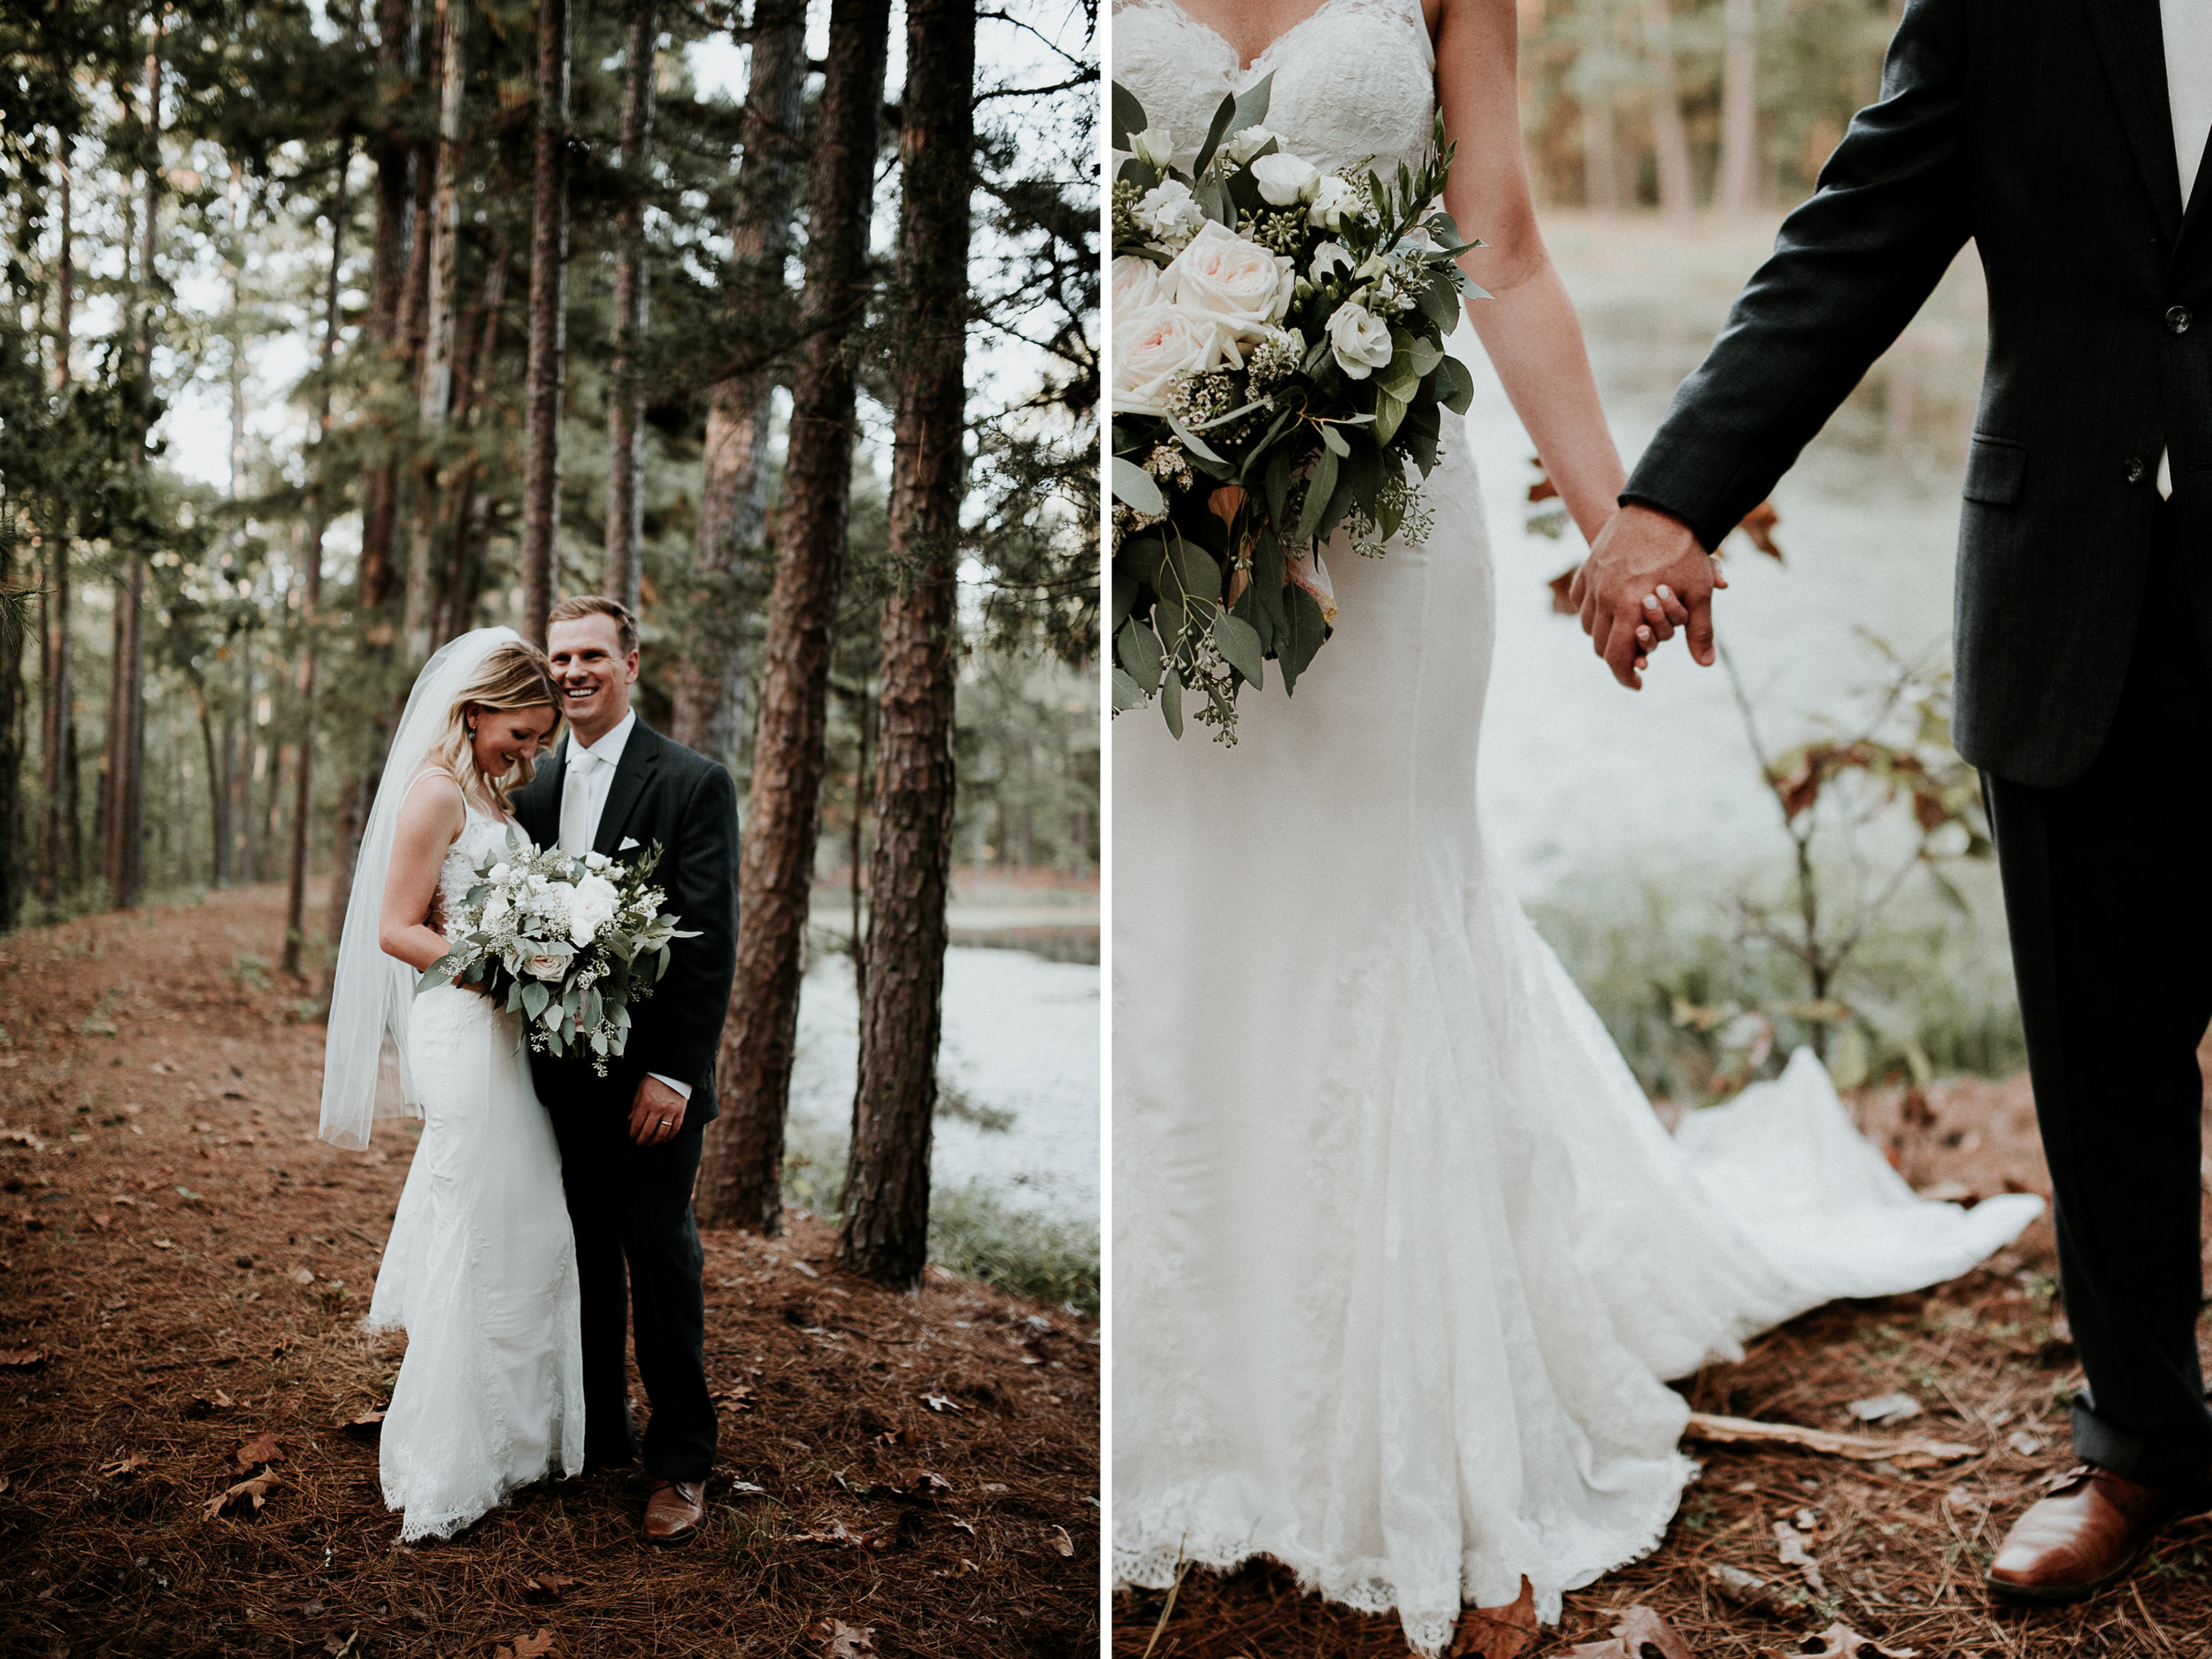 Zach&Rosalie St. Louis Wedding Photographer 6.jpg